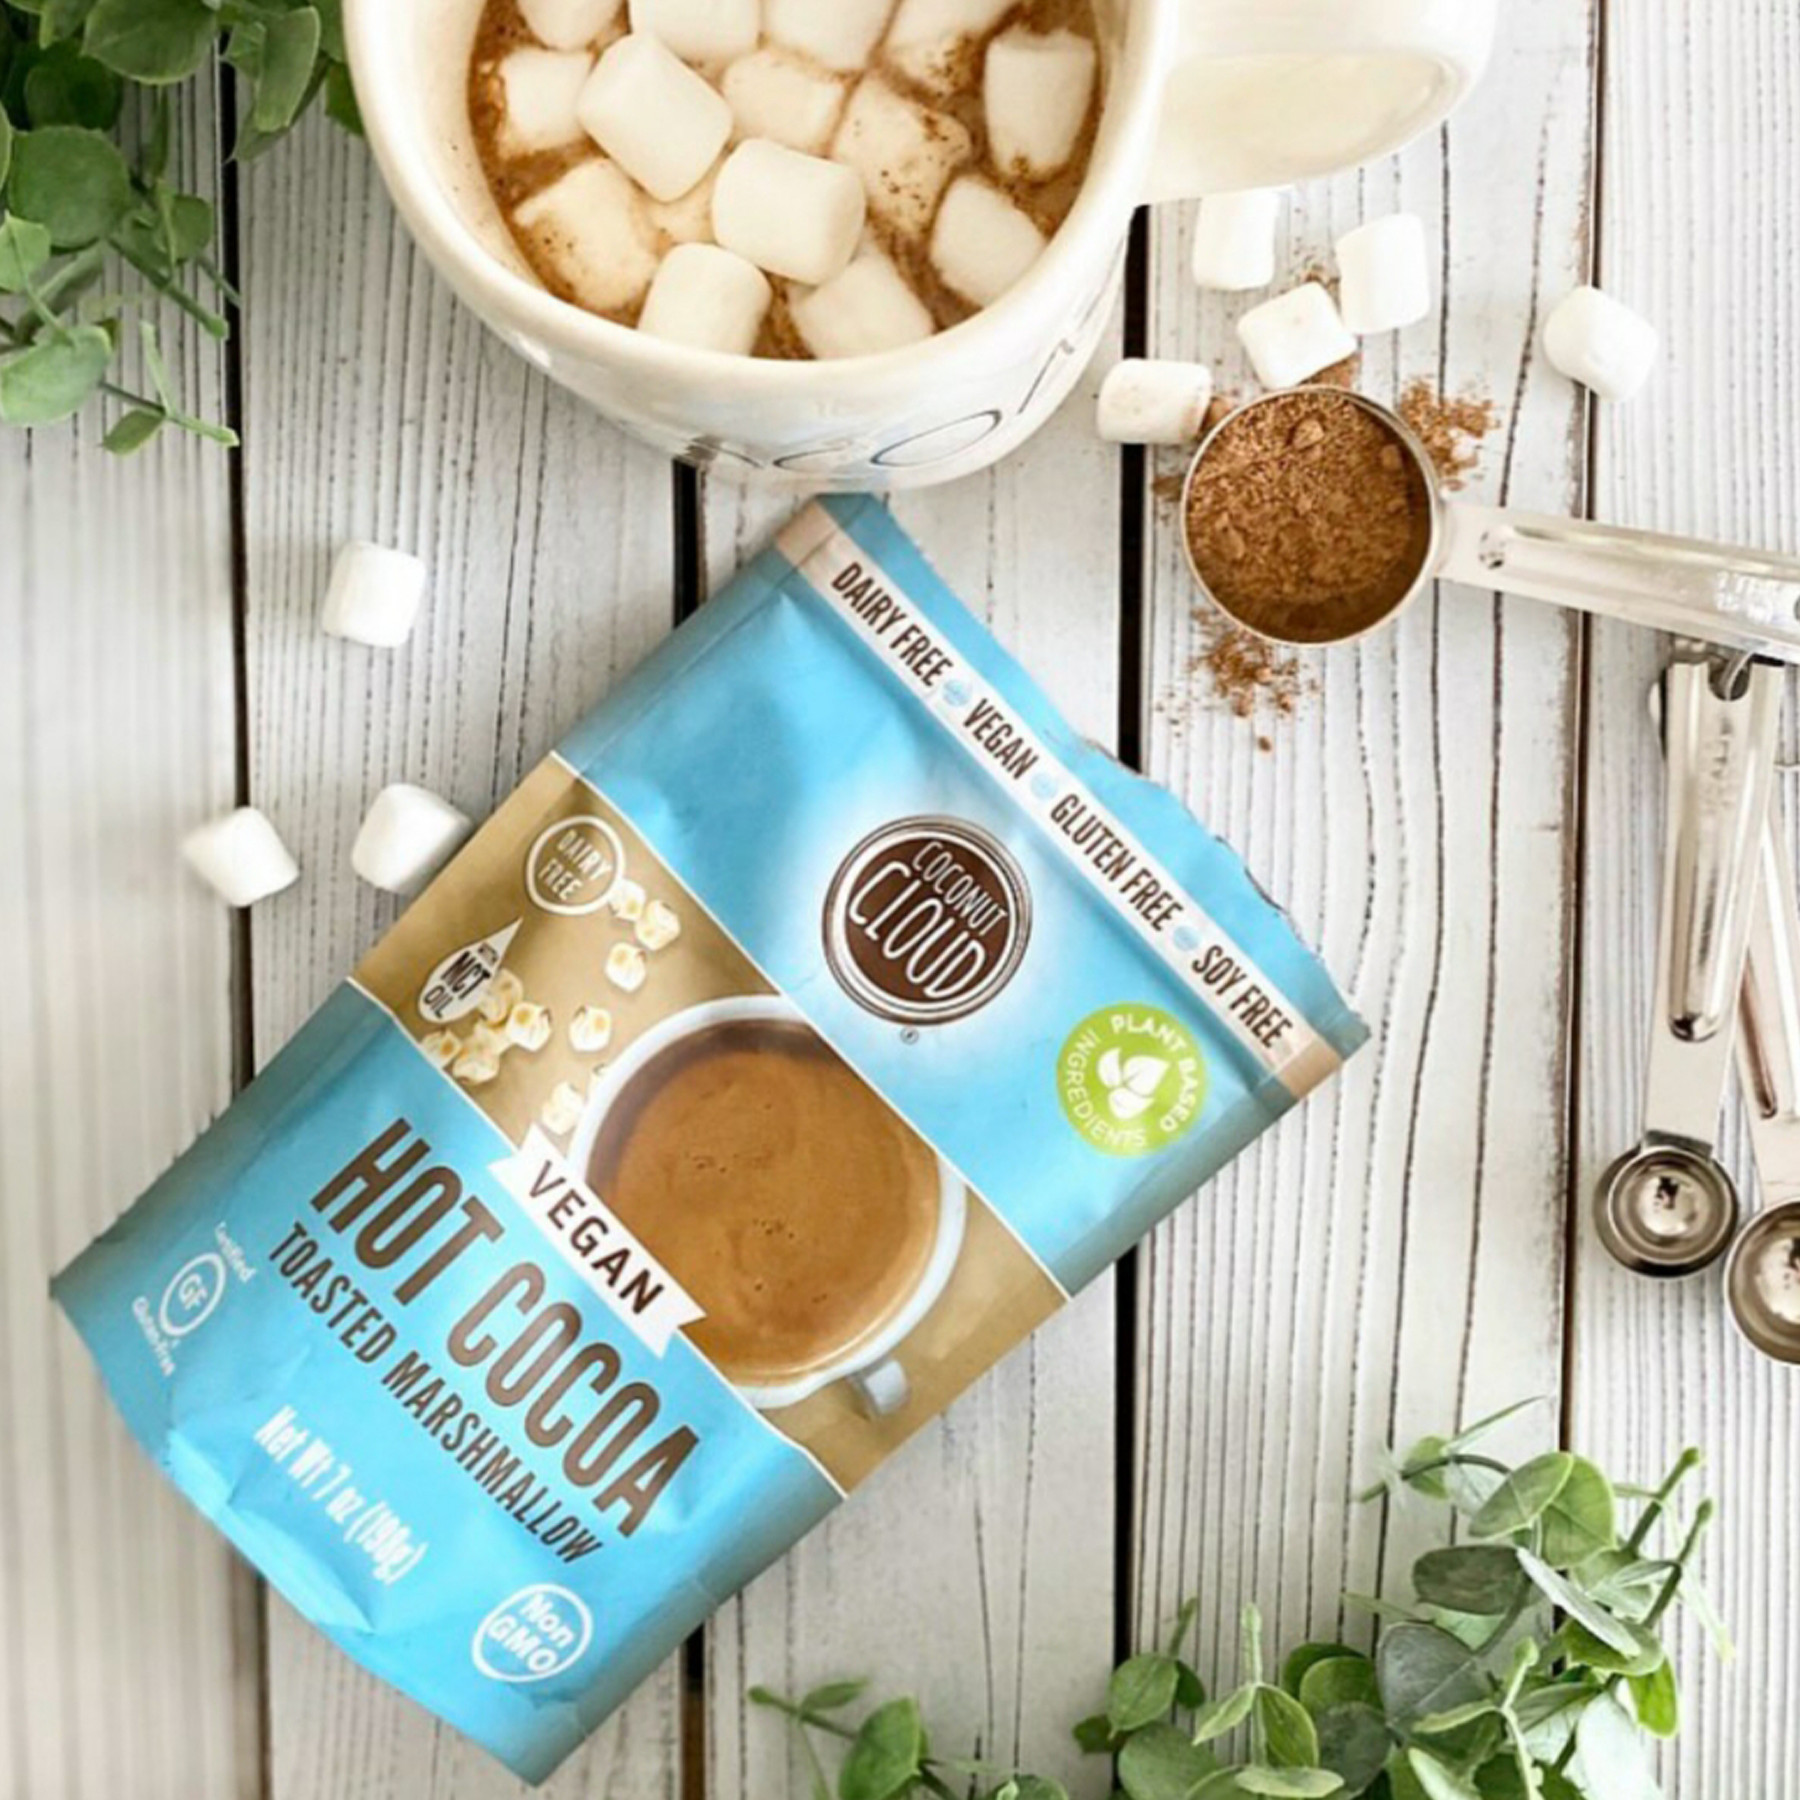 Coconut Cloud - Toasted Marshmallow Cocoa